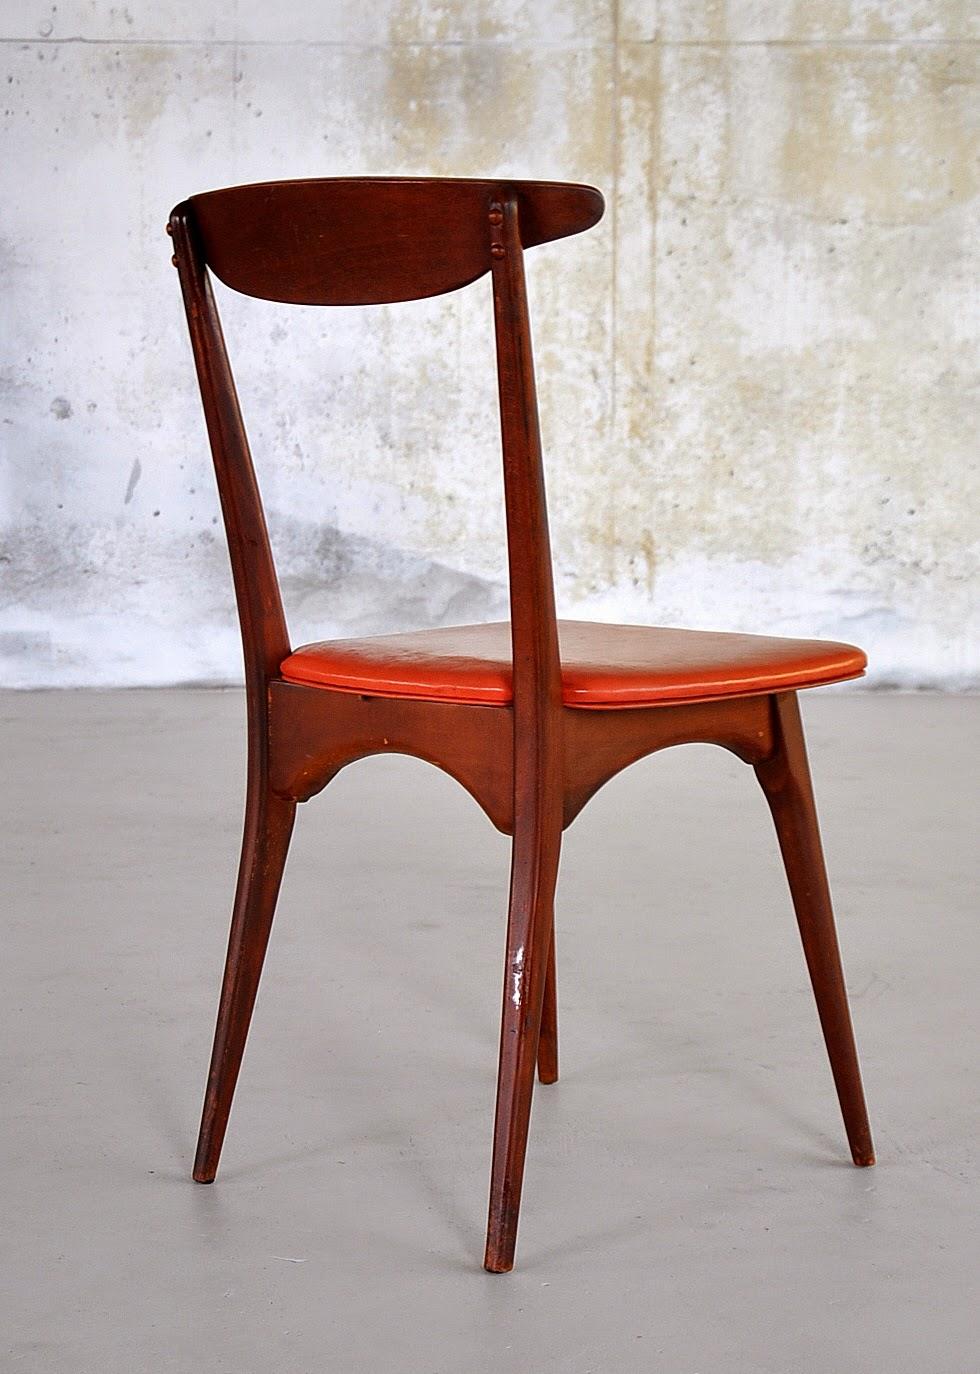 Modern Coffe Side Stool Designs : SELECT MODERN: Danish Modern Desk, Vanity Table or Side Chair